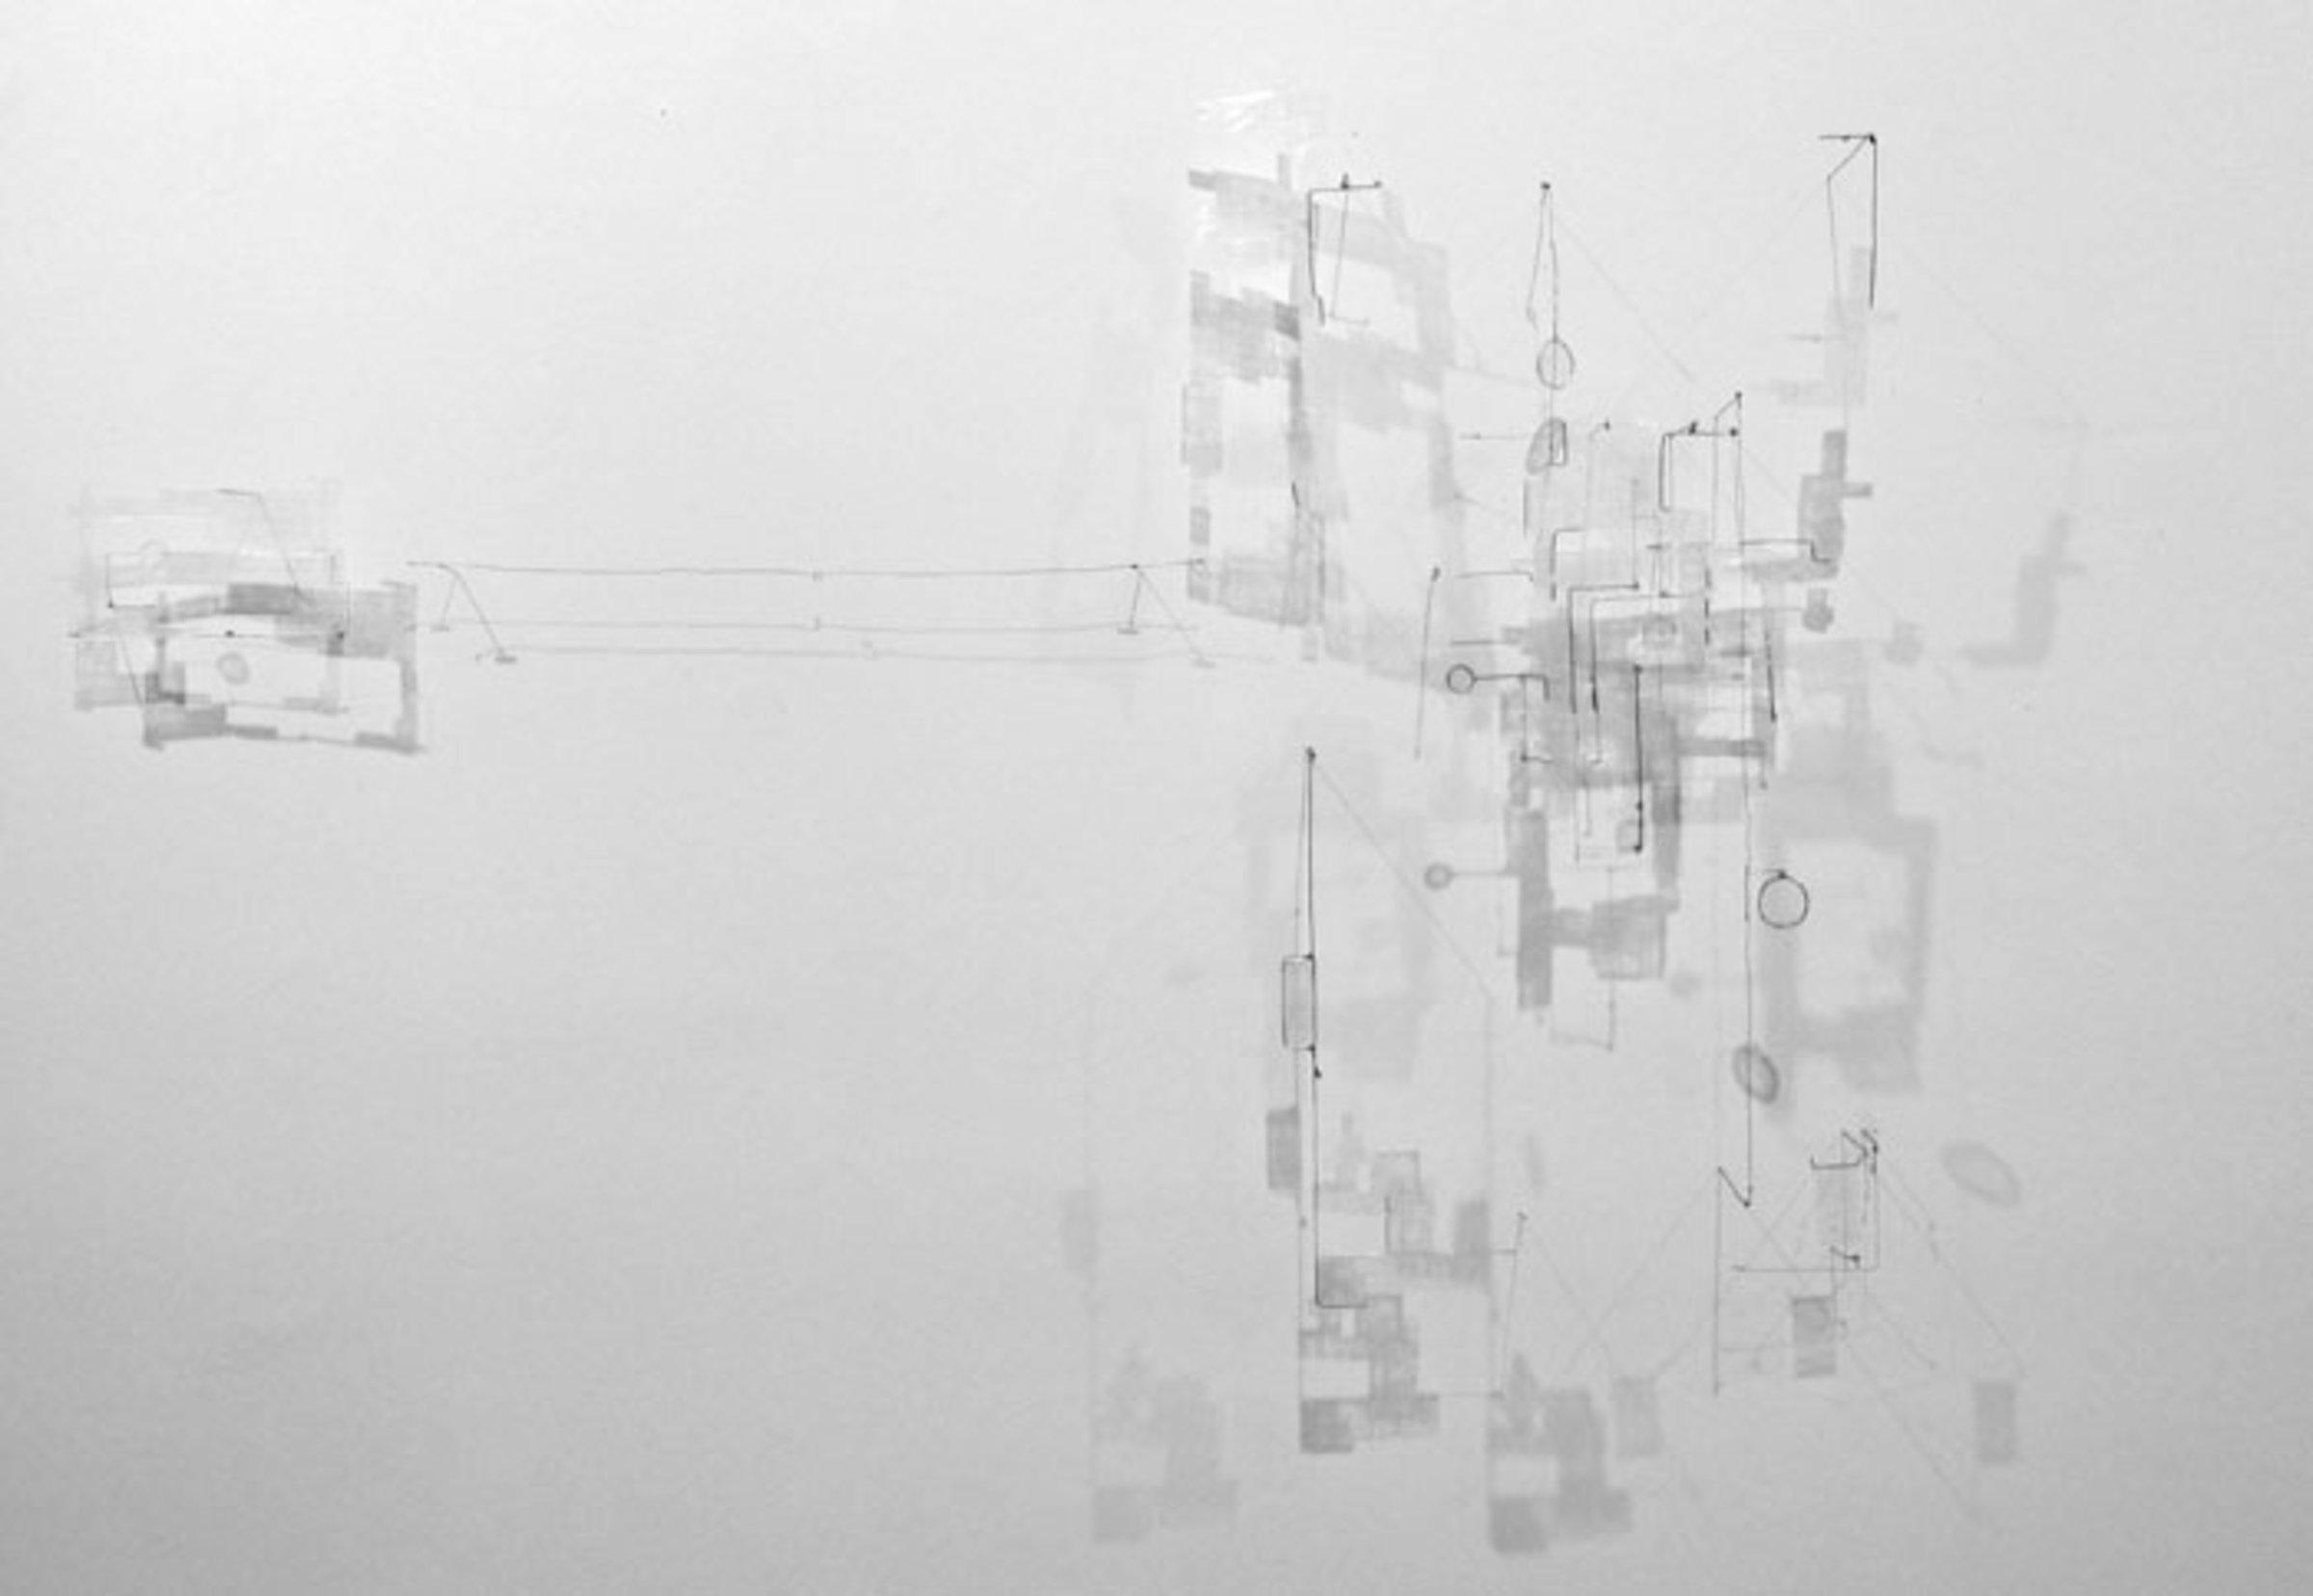 Robert Strati, Outlines, 2012